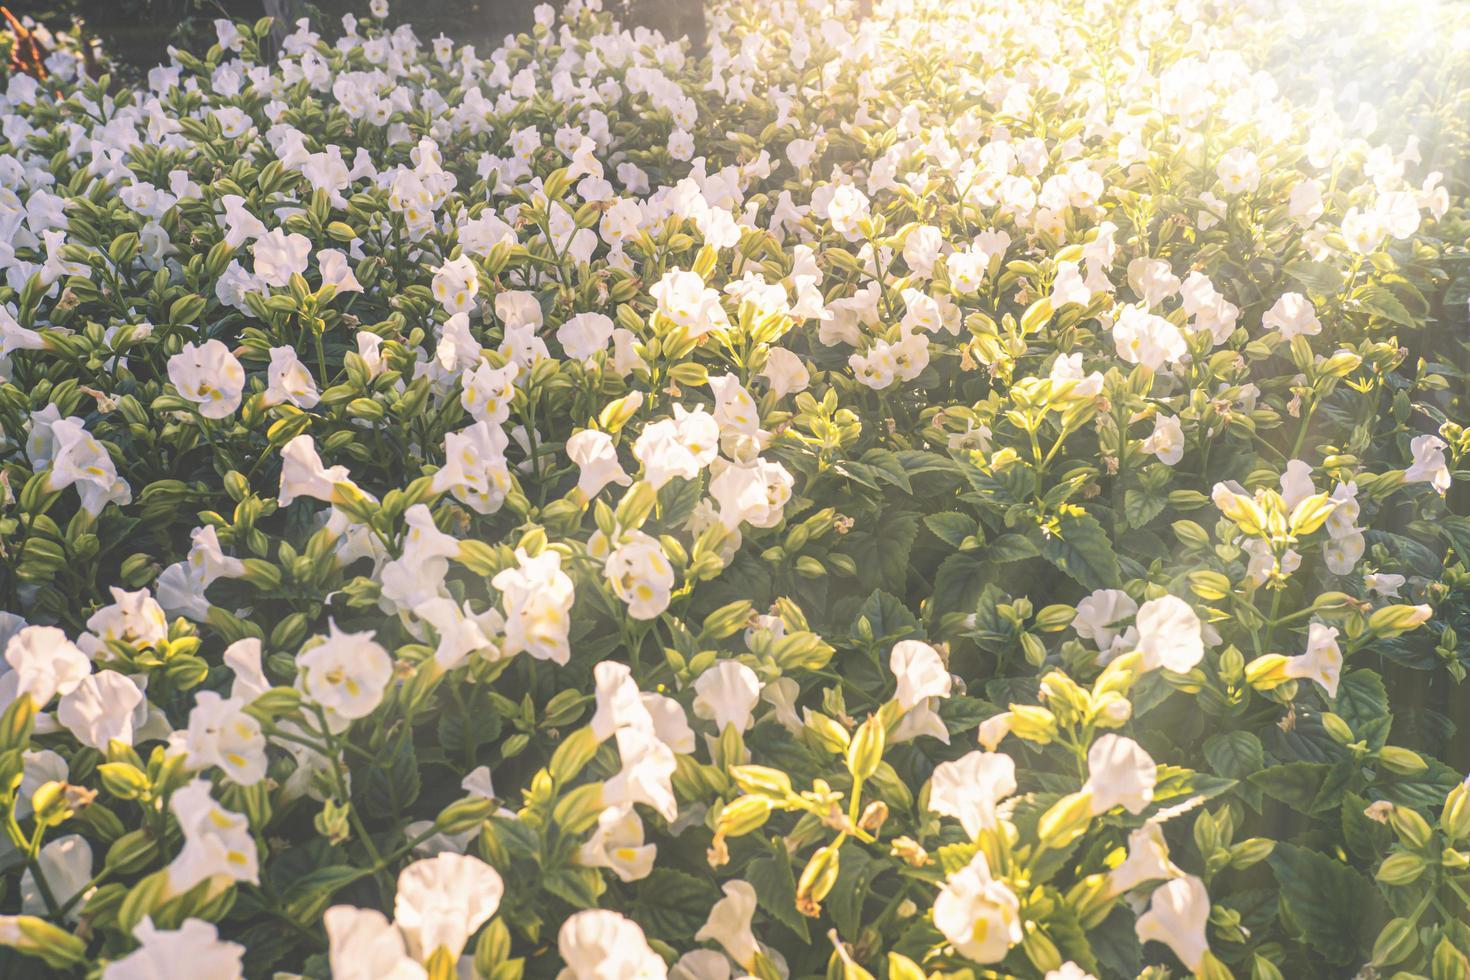 vita blommor i solljus foto